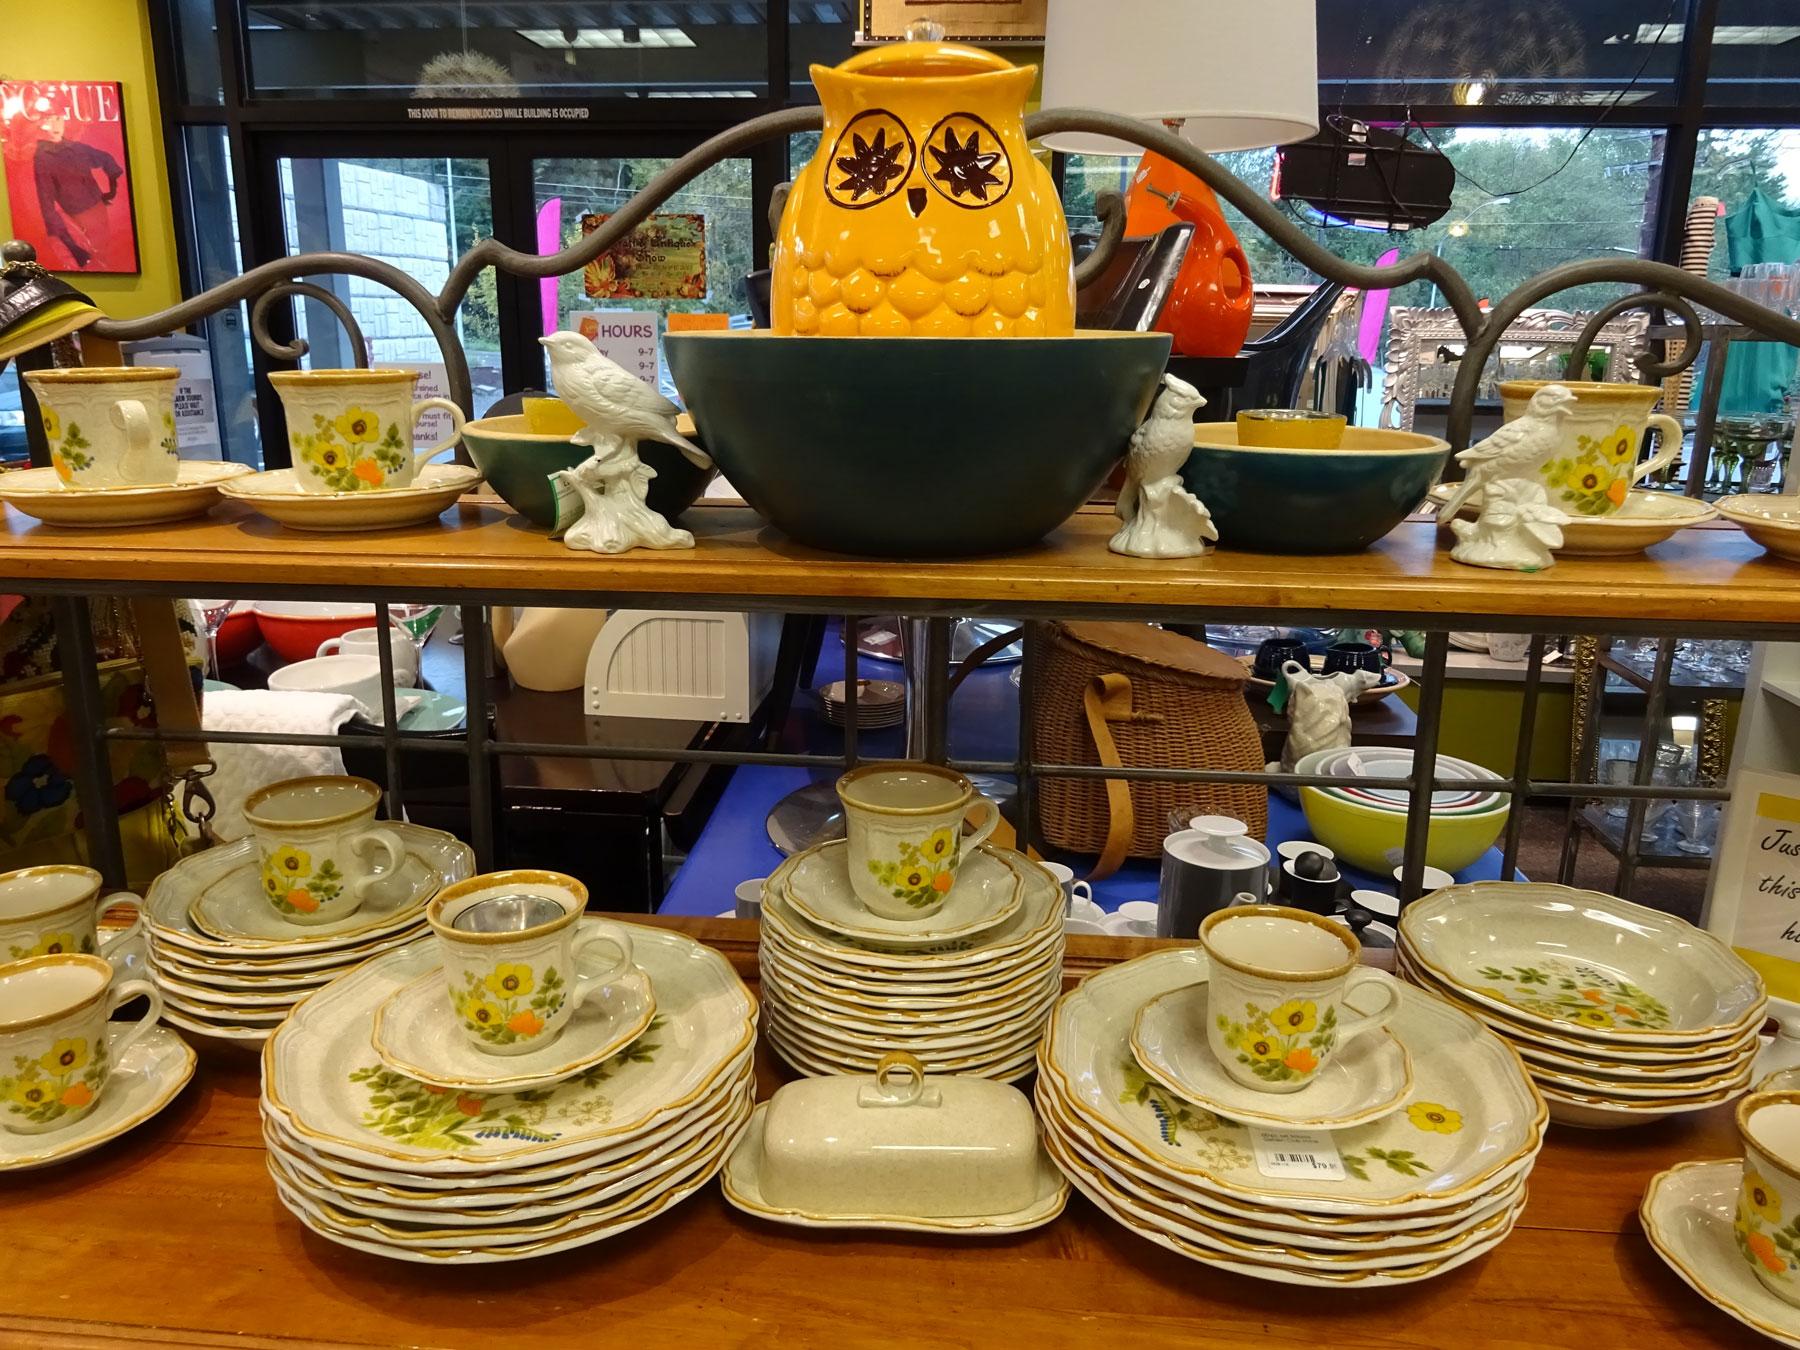 DSC00852-flower-dishes-owl-1800x1350